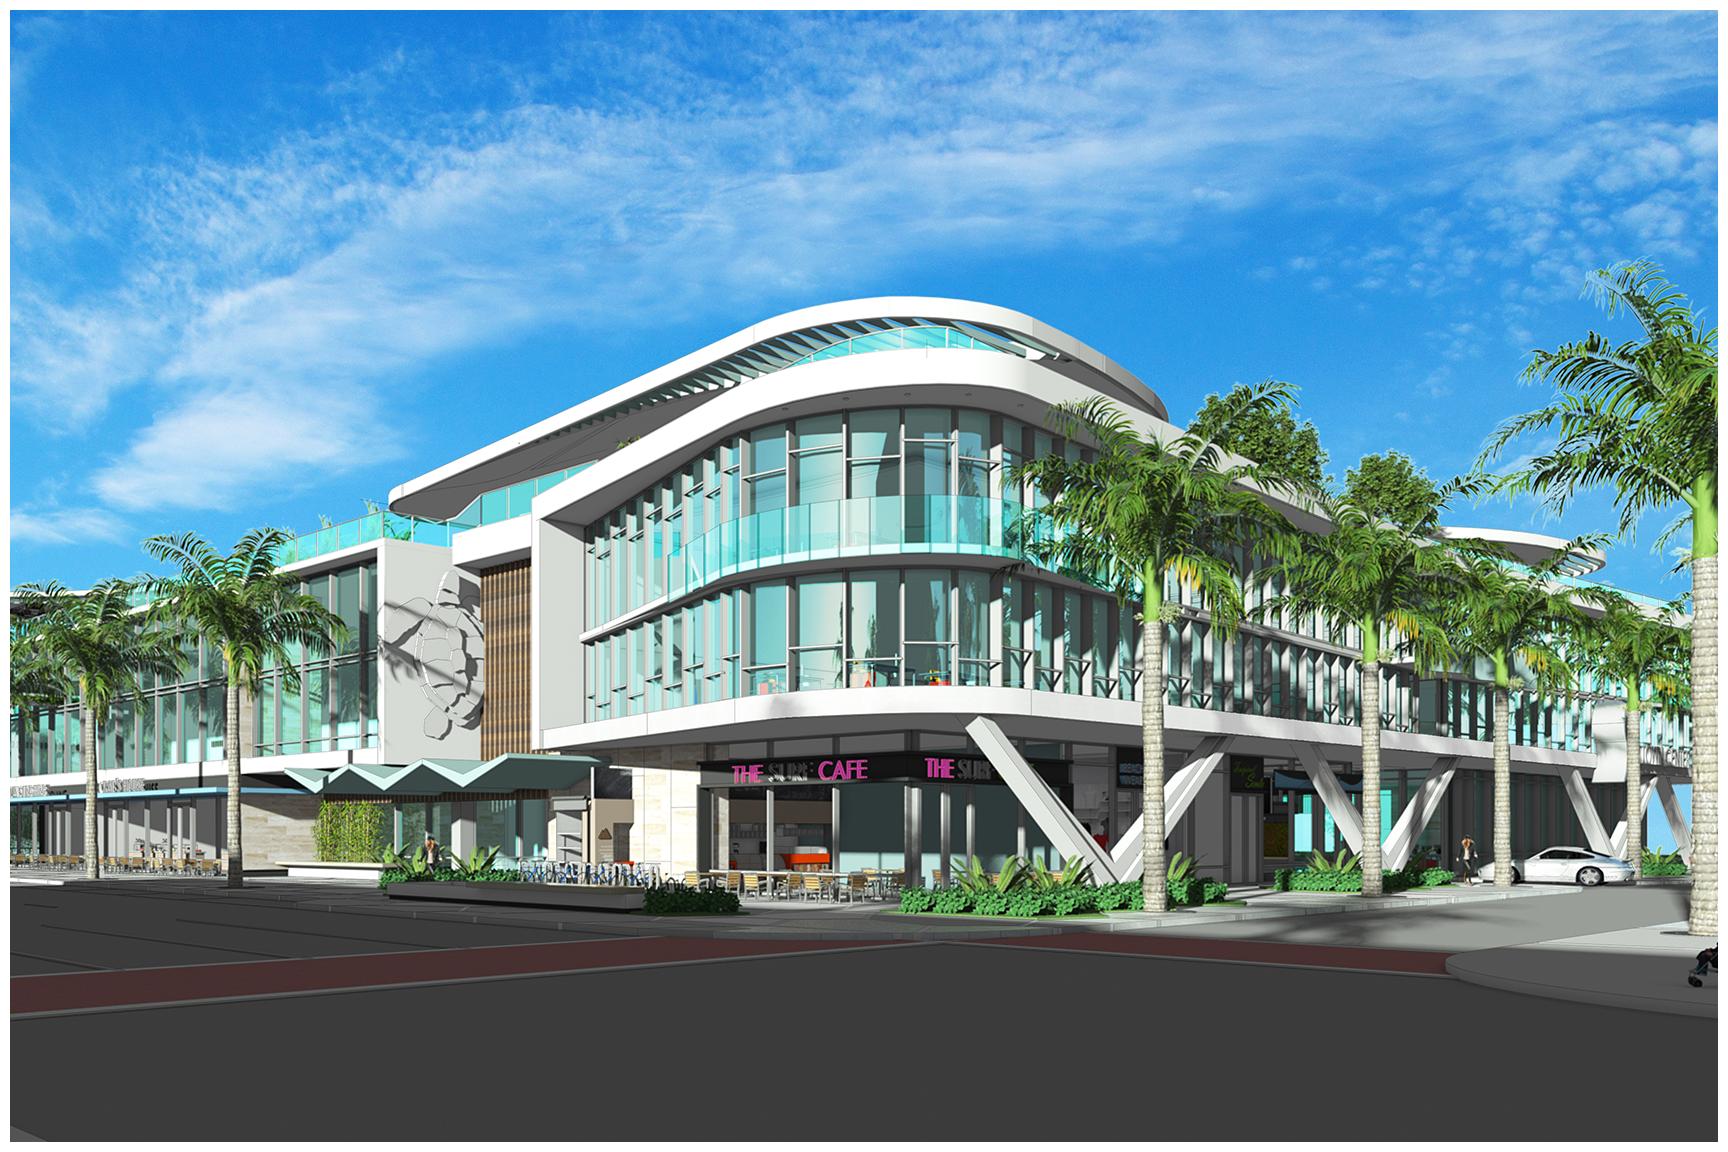 Surside Town Center